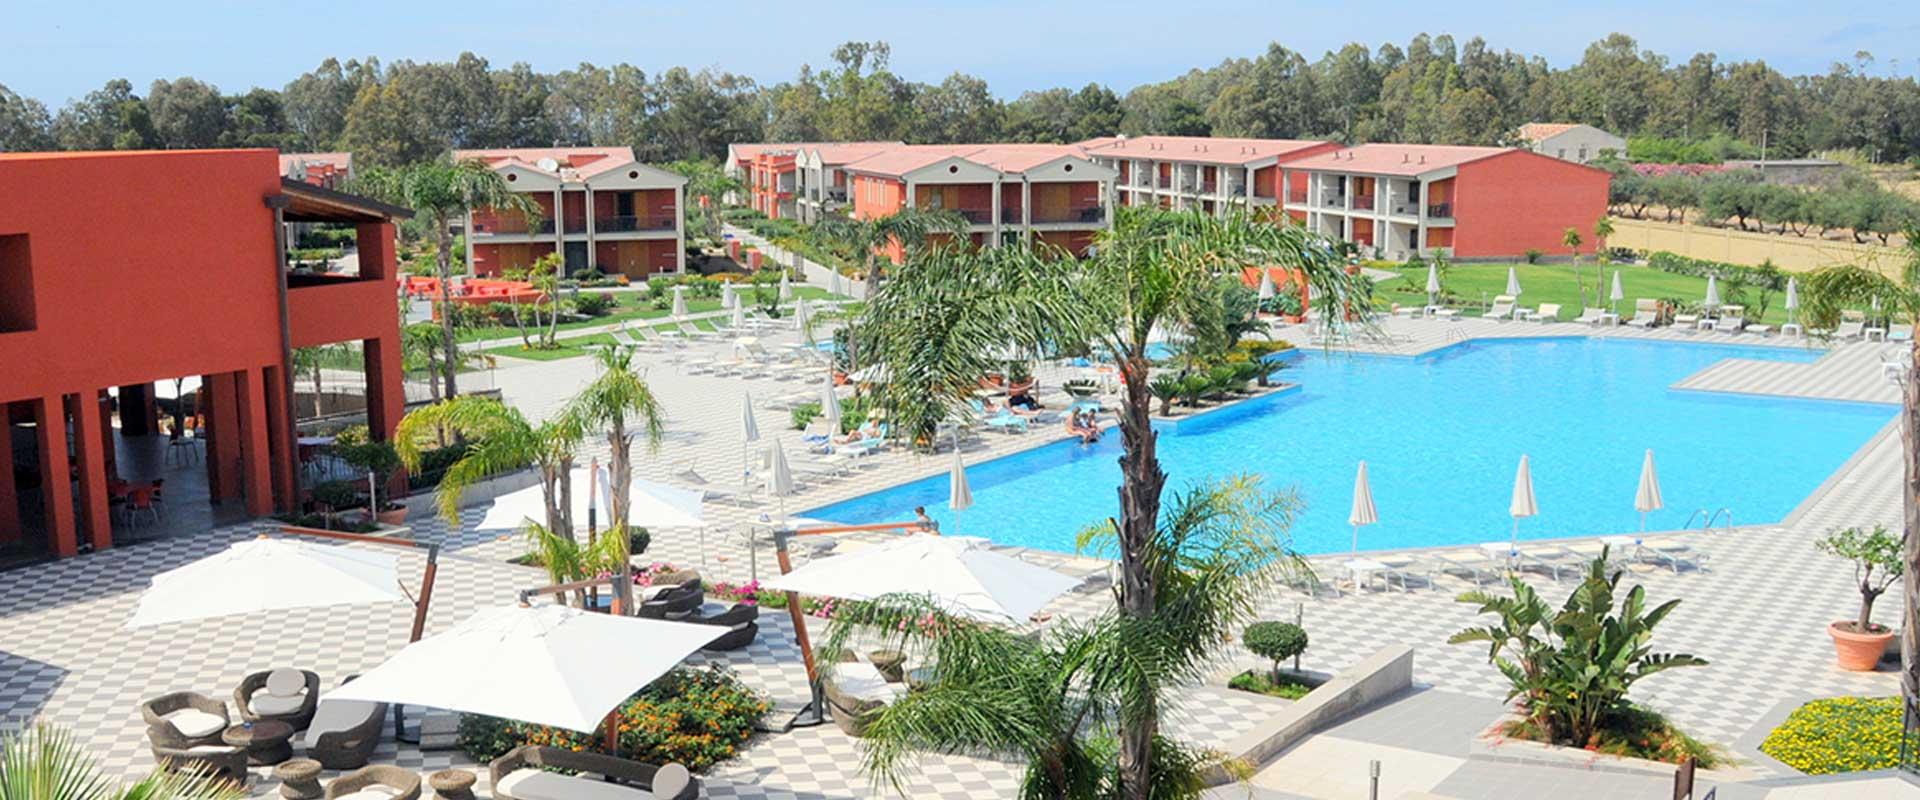 Villaggio voi arenella resort for Hotel resort siracusa